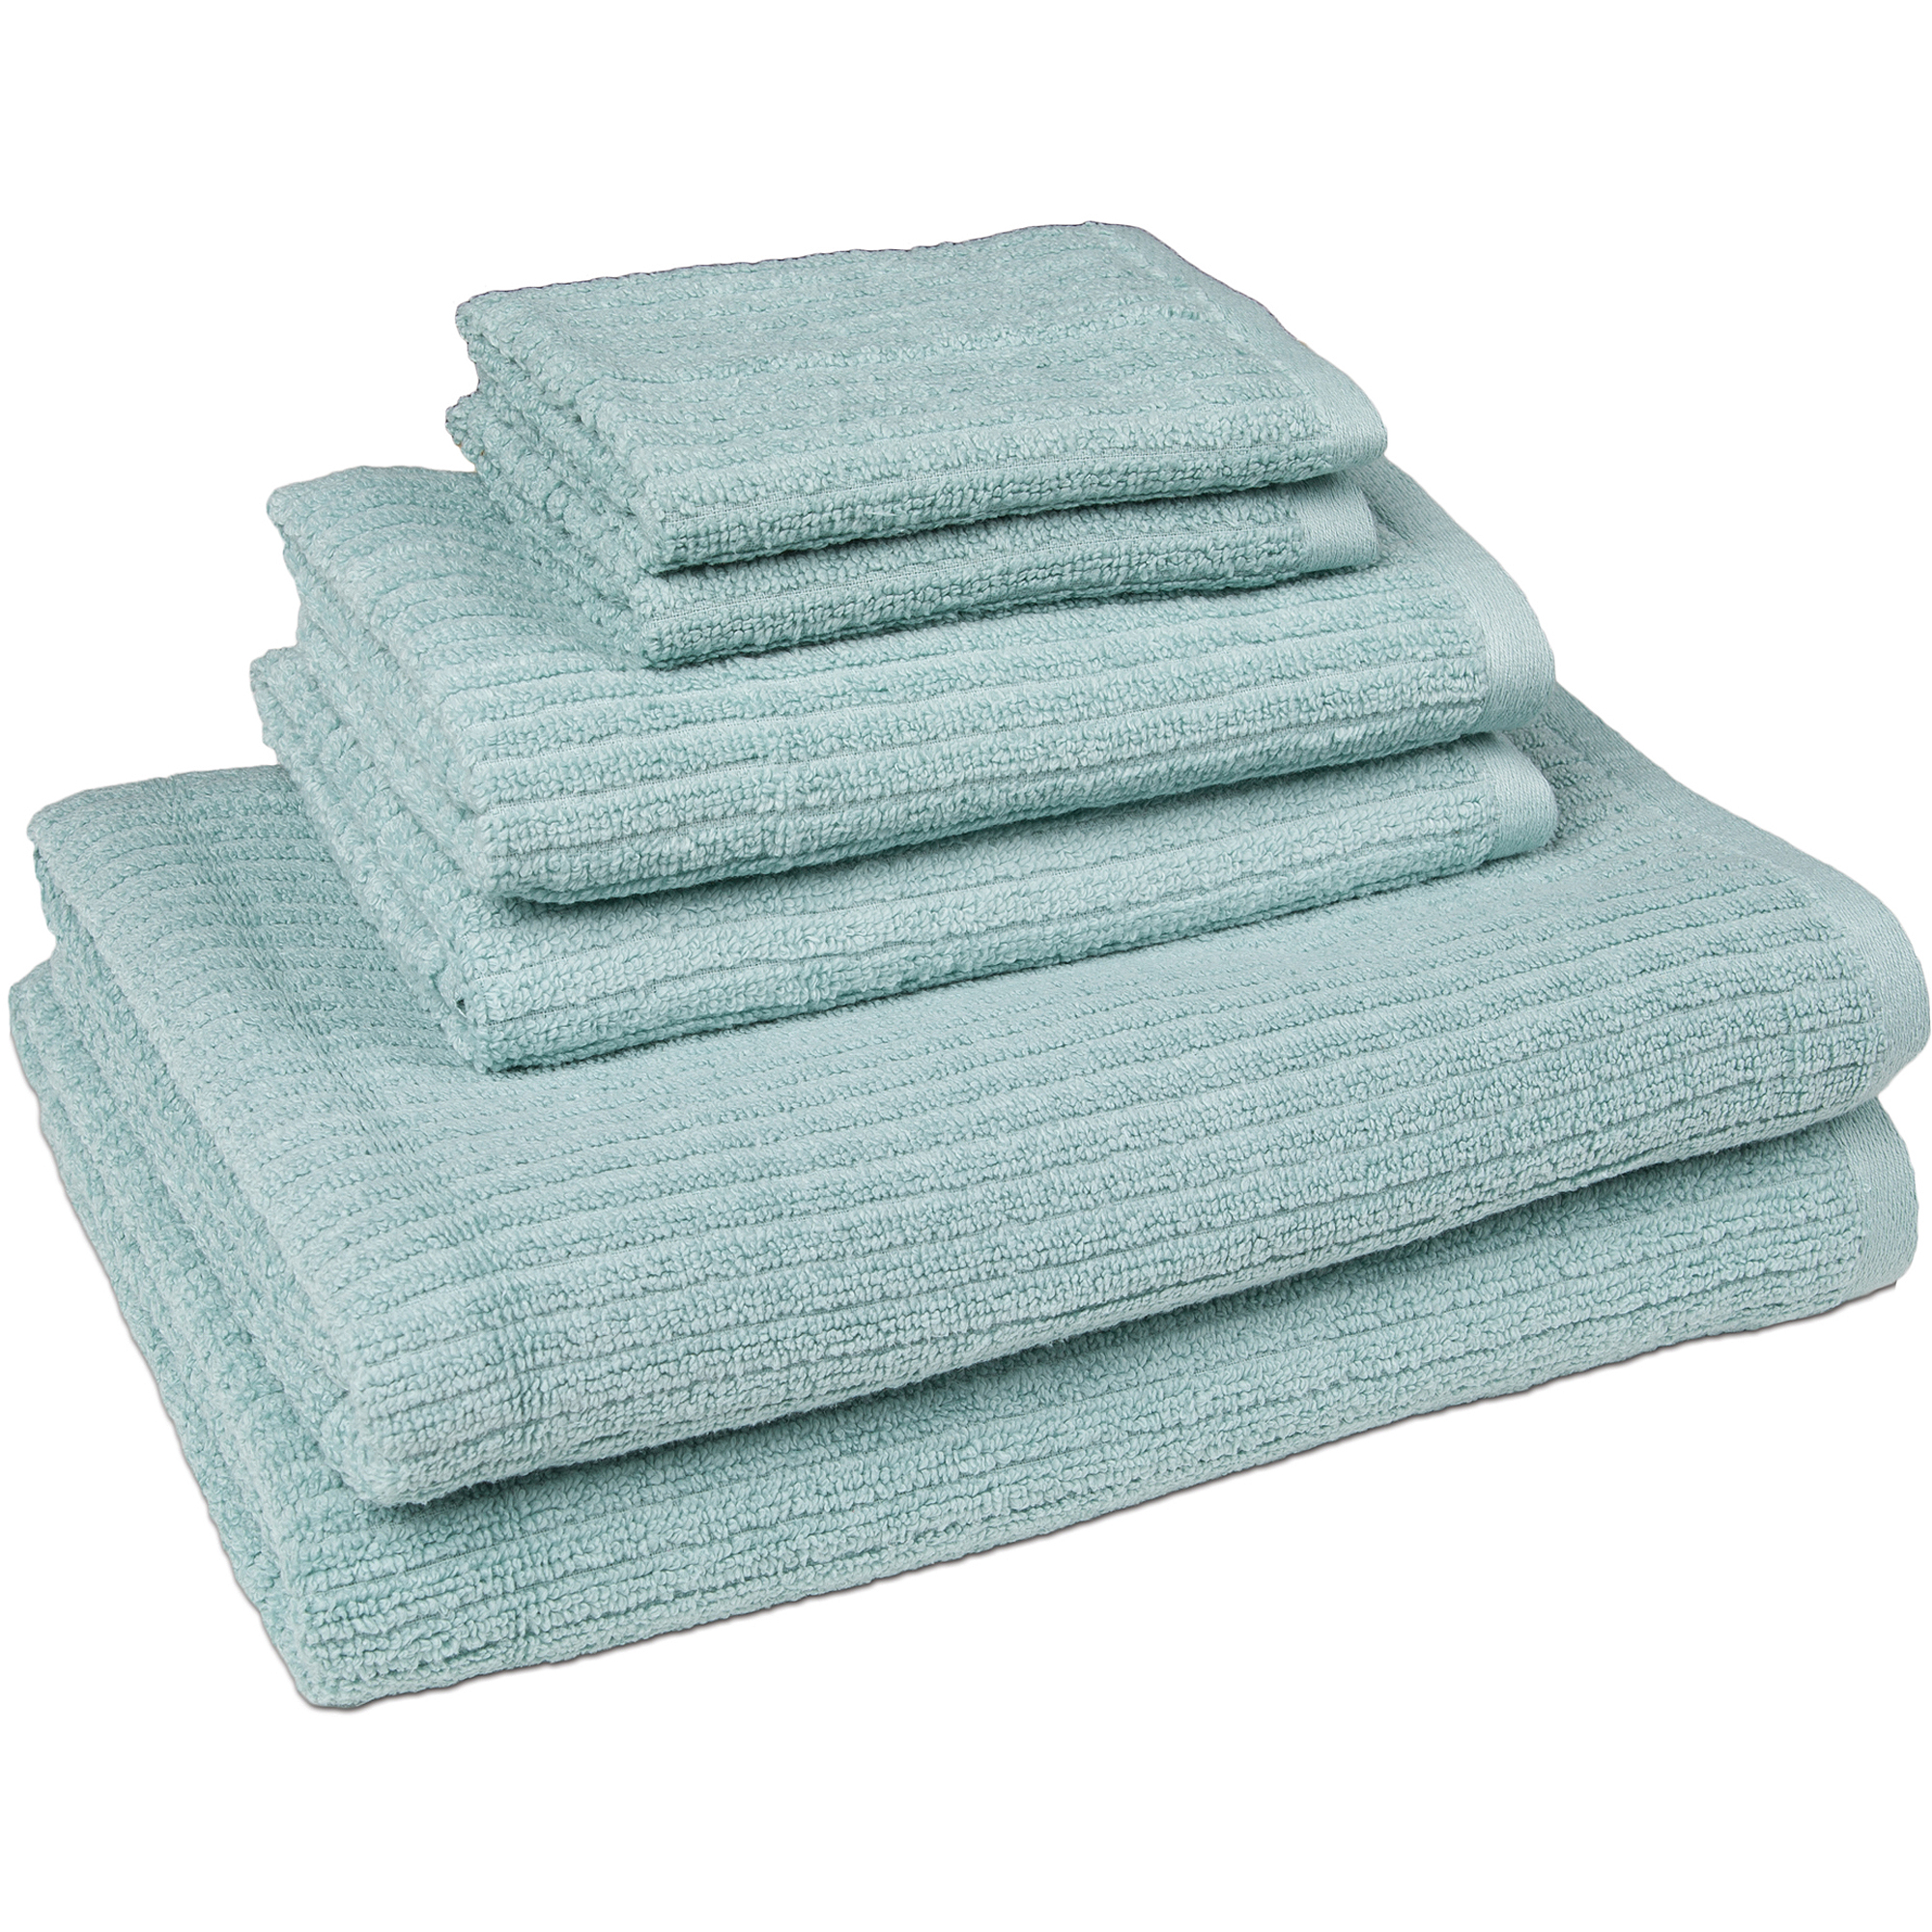 Stratford Quick Dry 6Piece Bath Towel Set Walmartcom